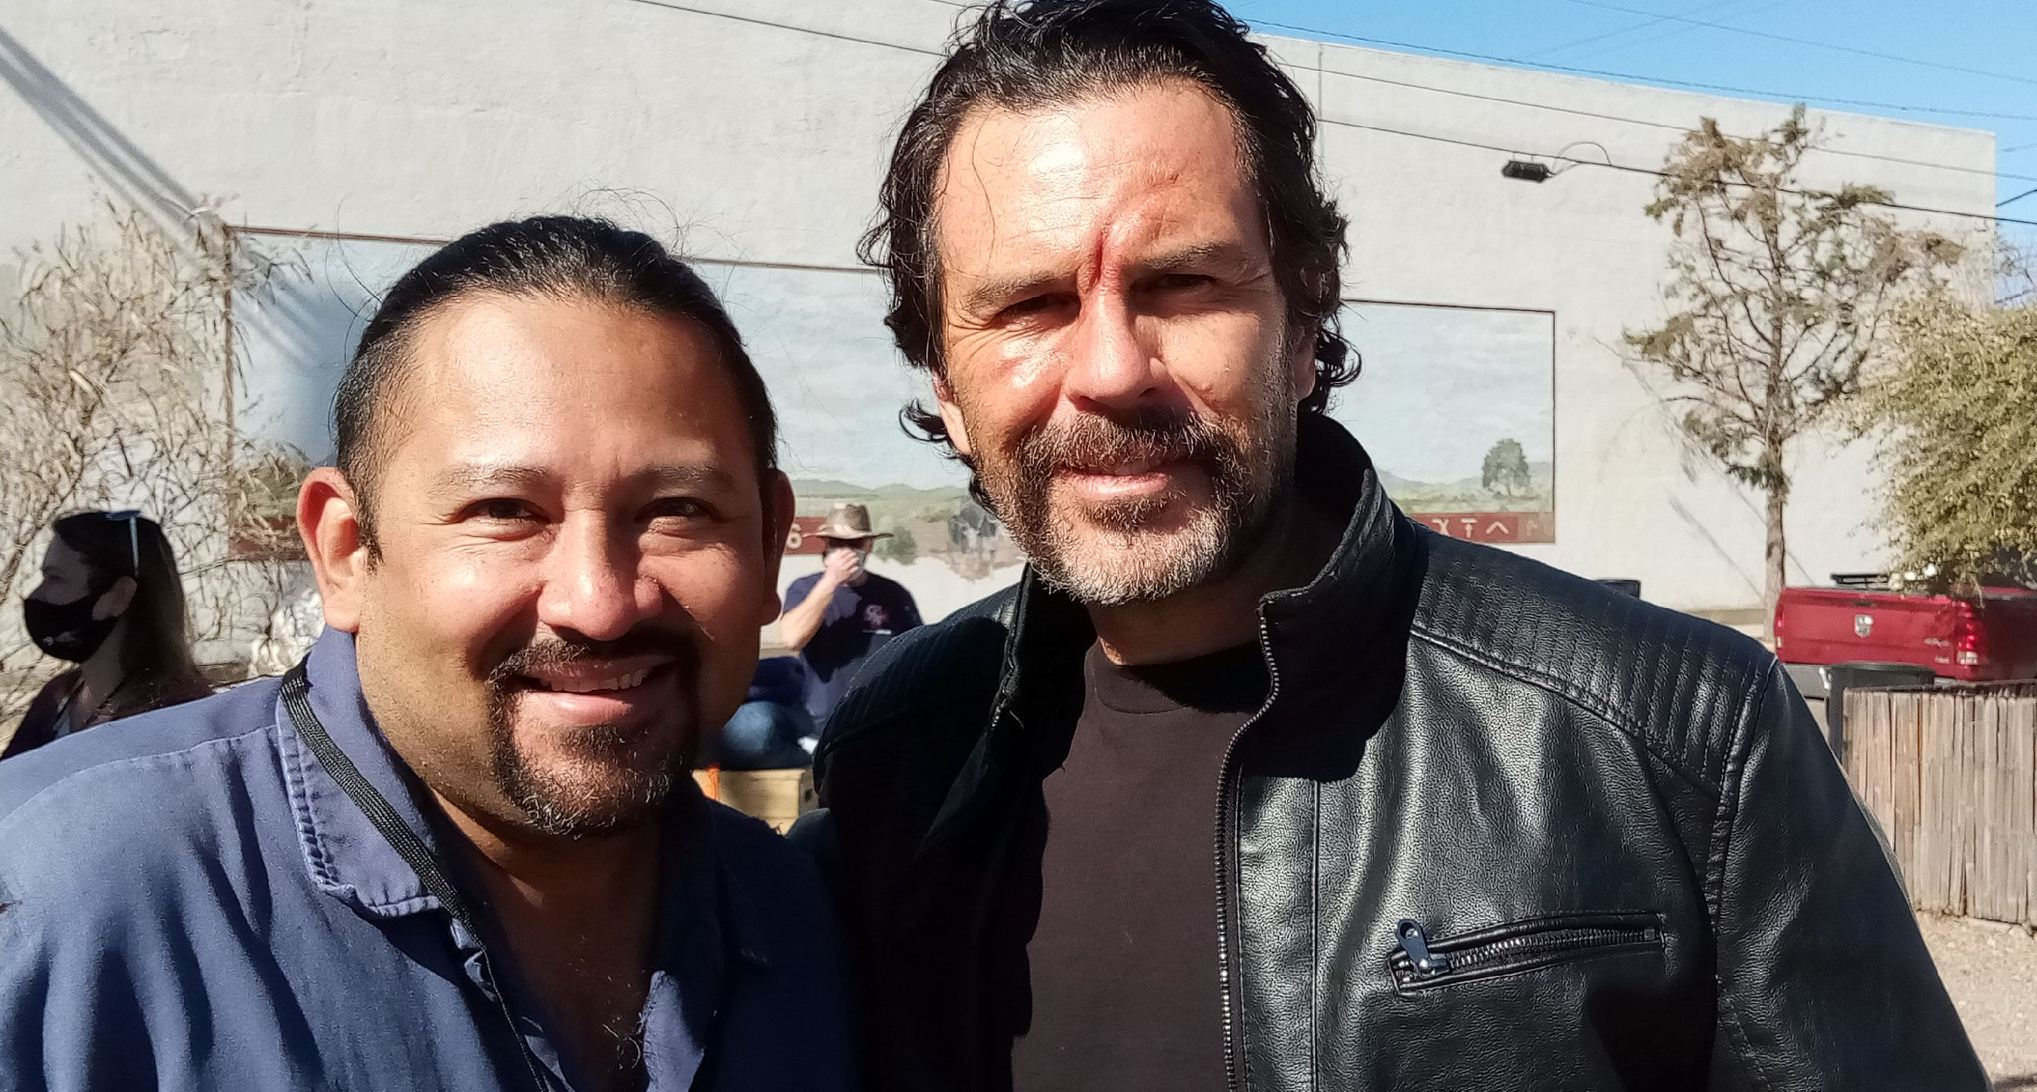 Santiago Villalobos and Marcus DeAnda